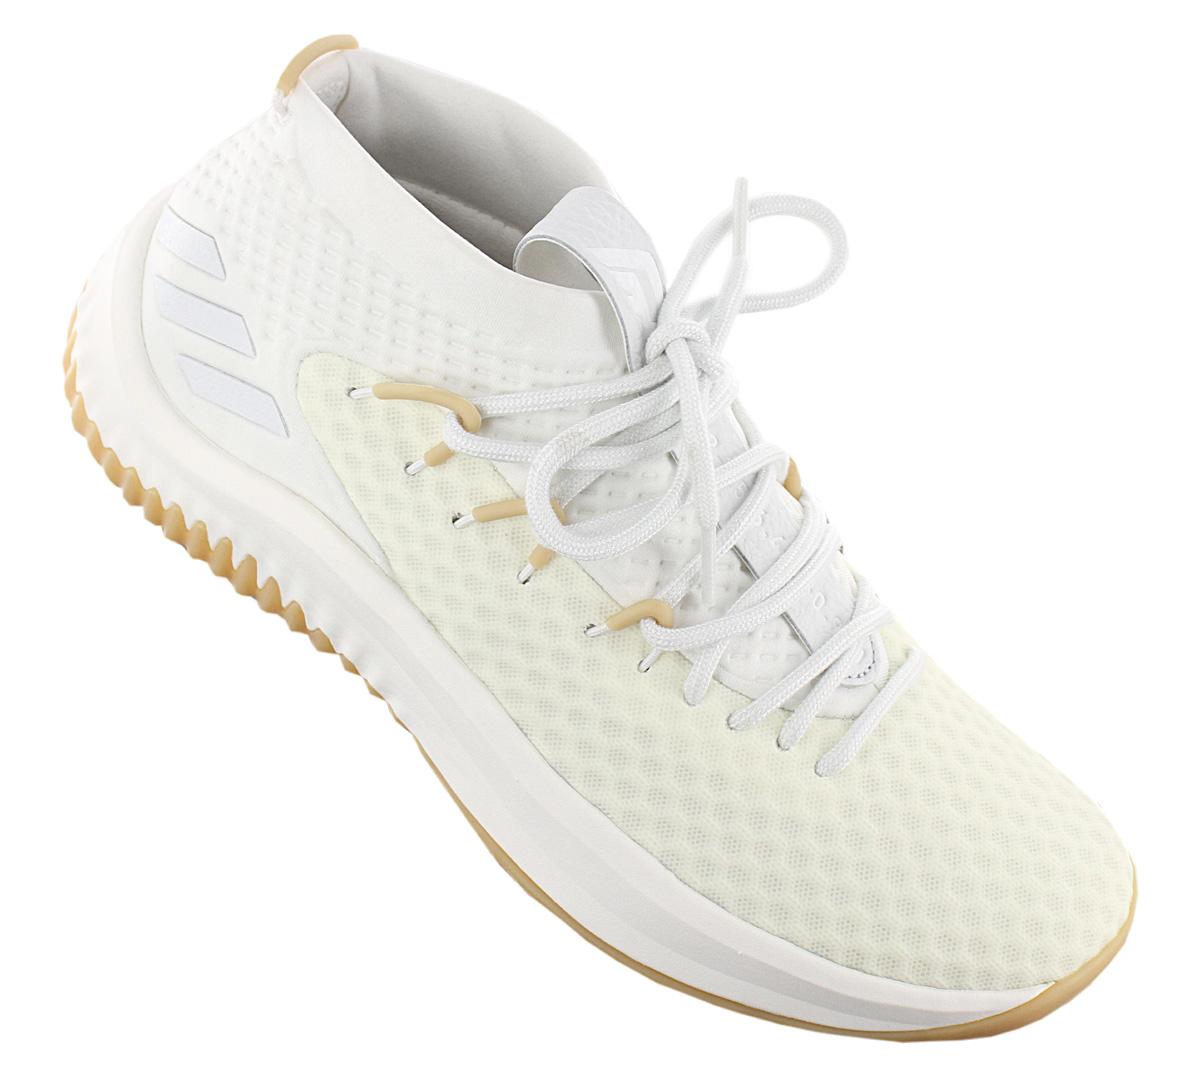 check out 24d82 72881 Adidas Dame Lillard 4